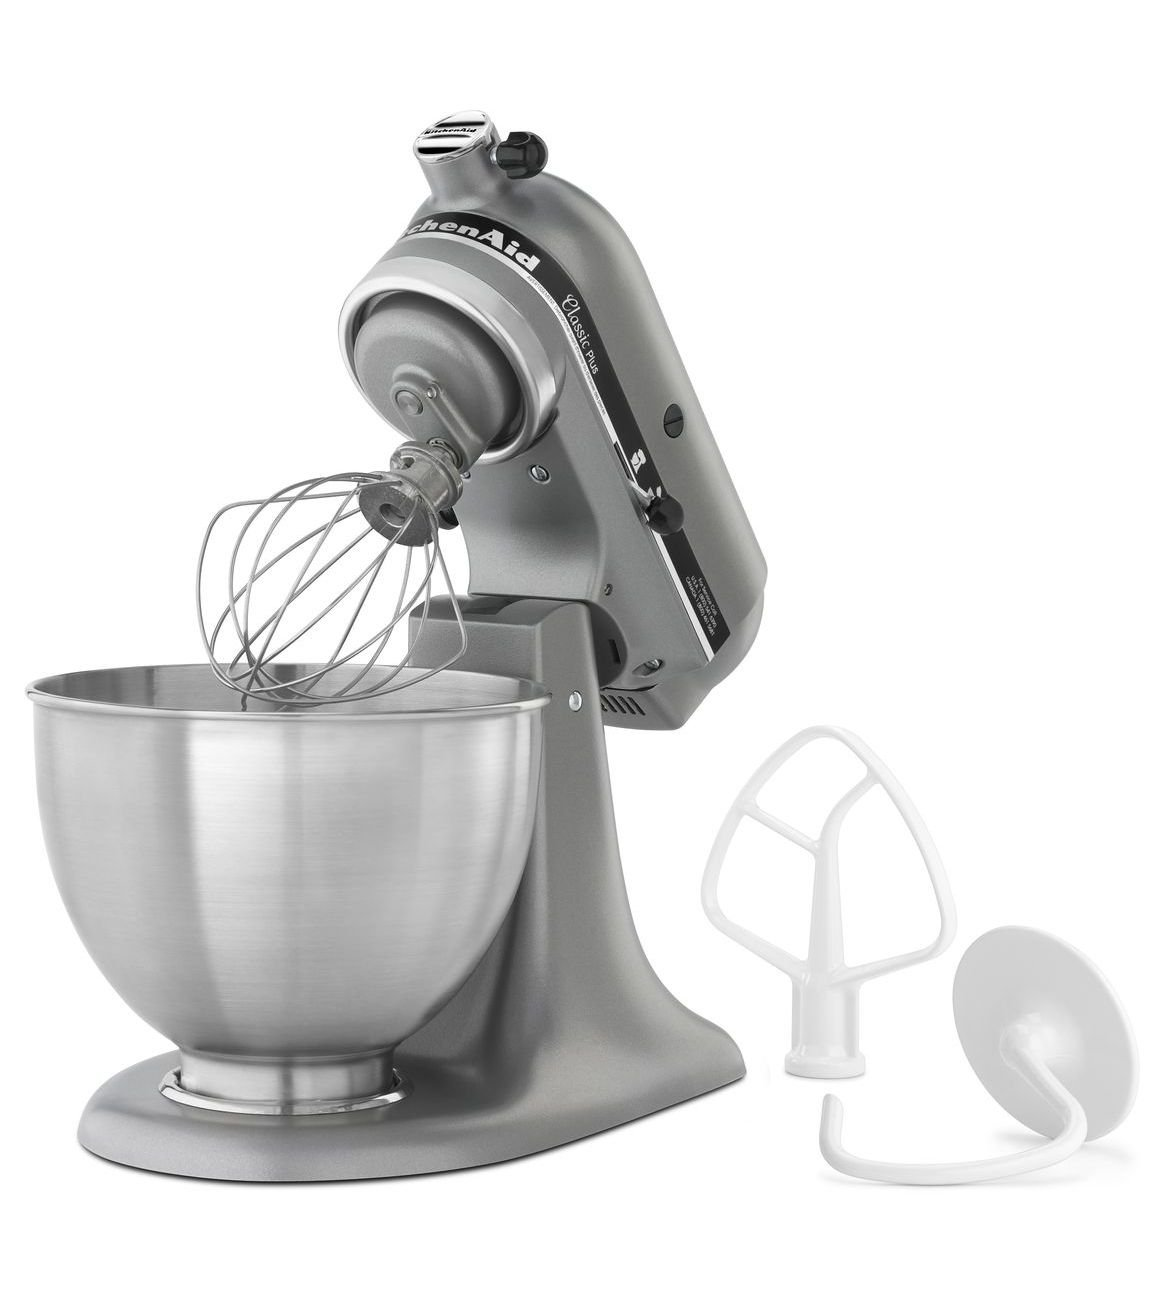 NEW KitchenAid 4.5-quart Tilt Head Stand Mixer w/bowl with handle